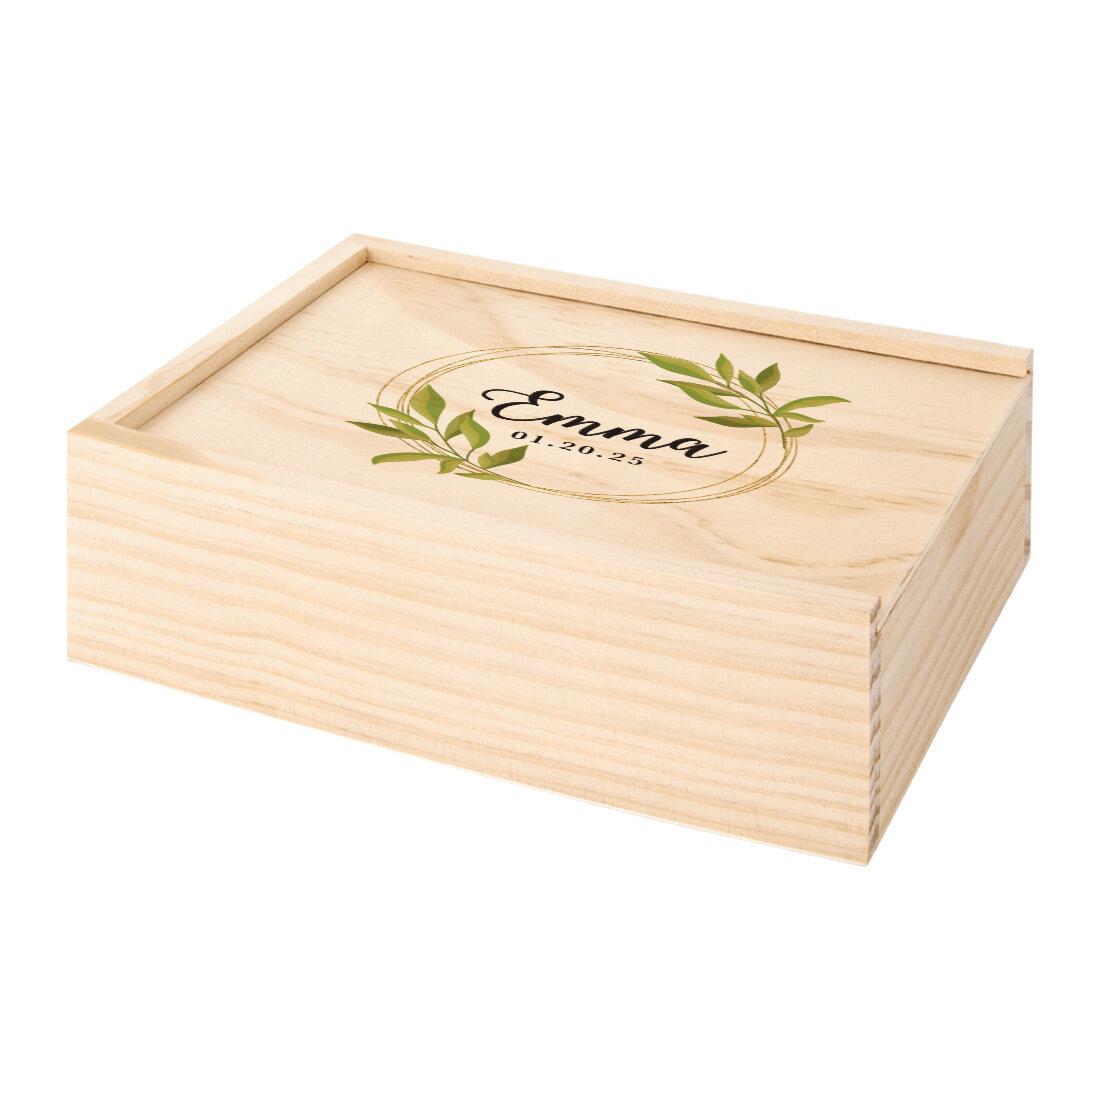 Le Prise Dovercourt Personalized Memory Box Wayfair